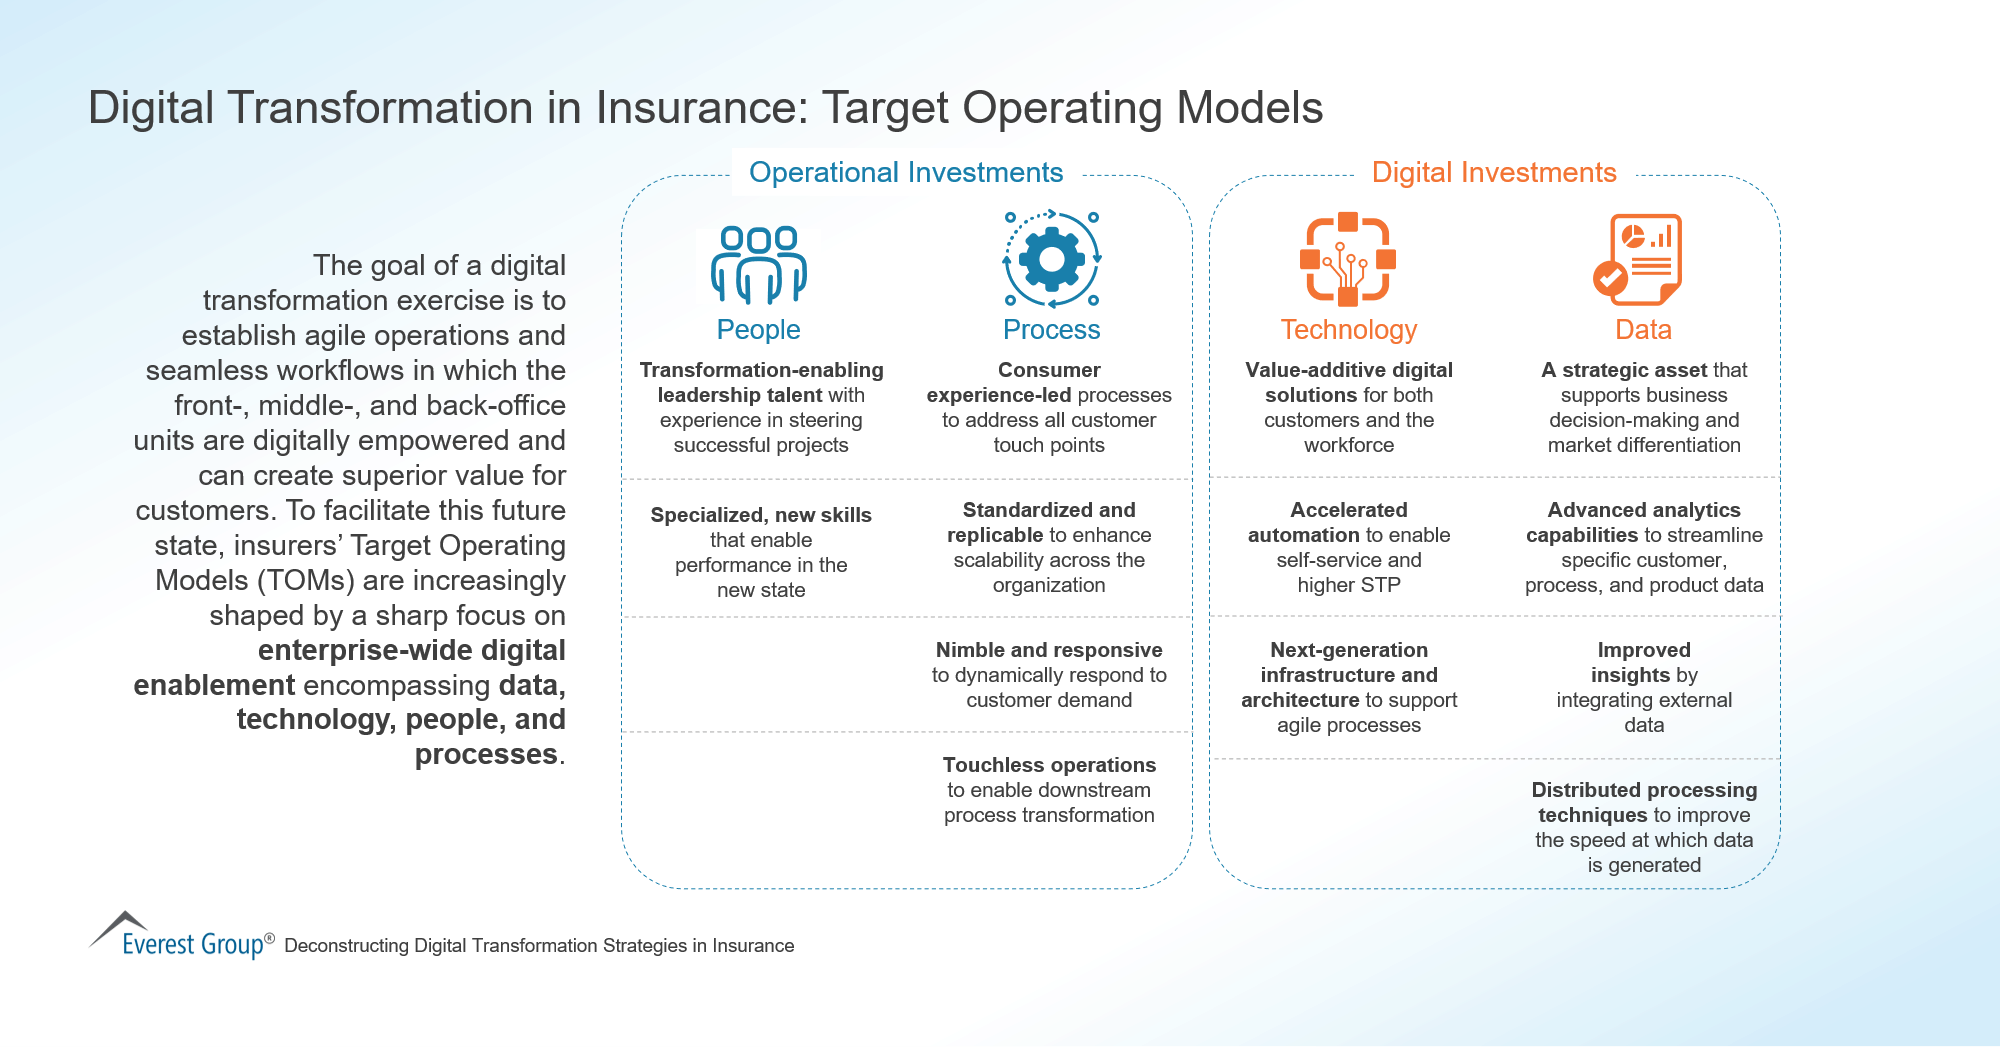 Digital Transformation in Insurance-Target Operating Models